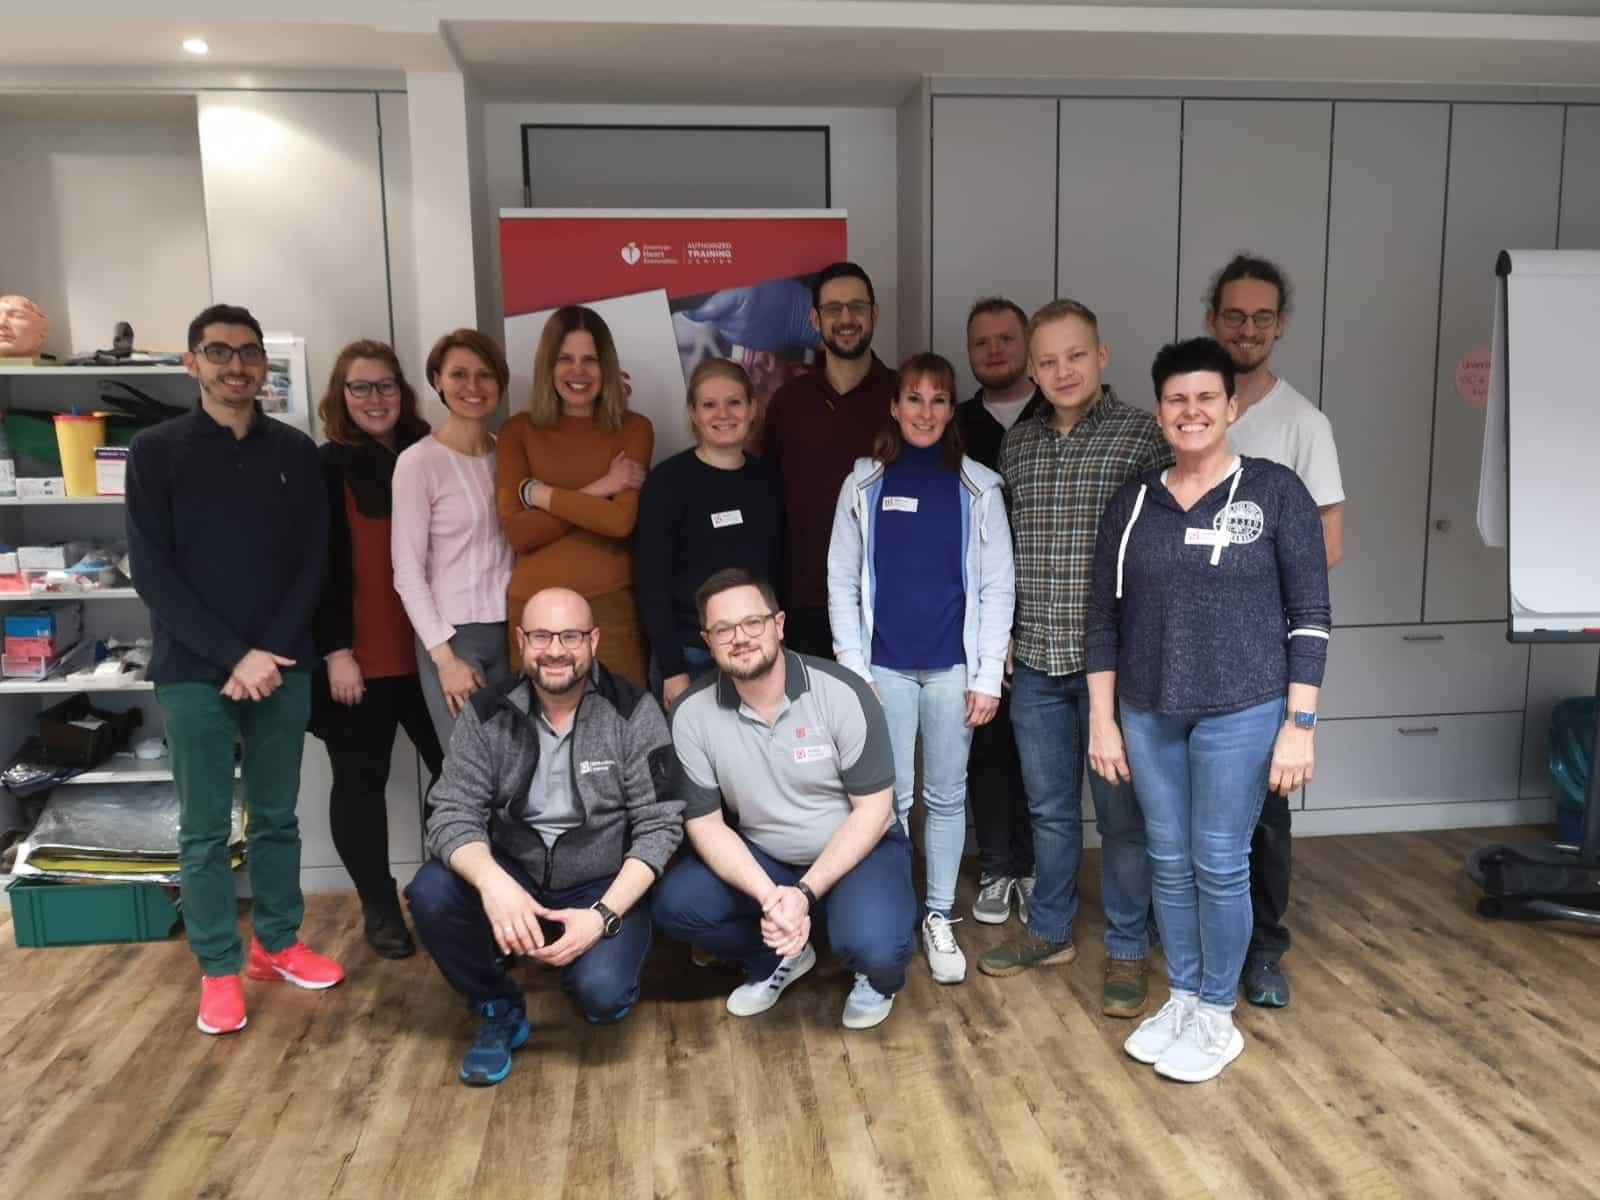 ACLS Provider & Refresher Kurs (AHA) in Frankfurt